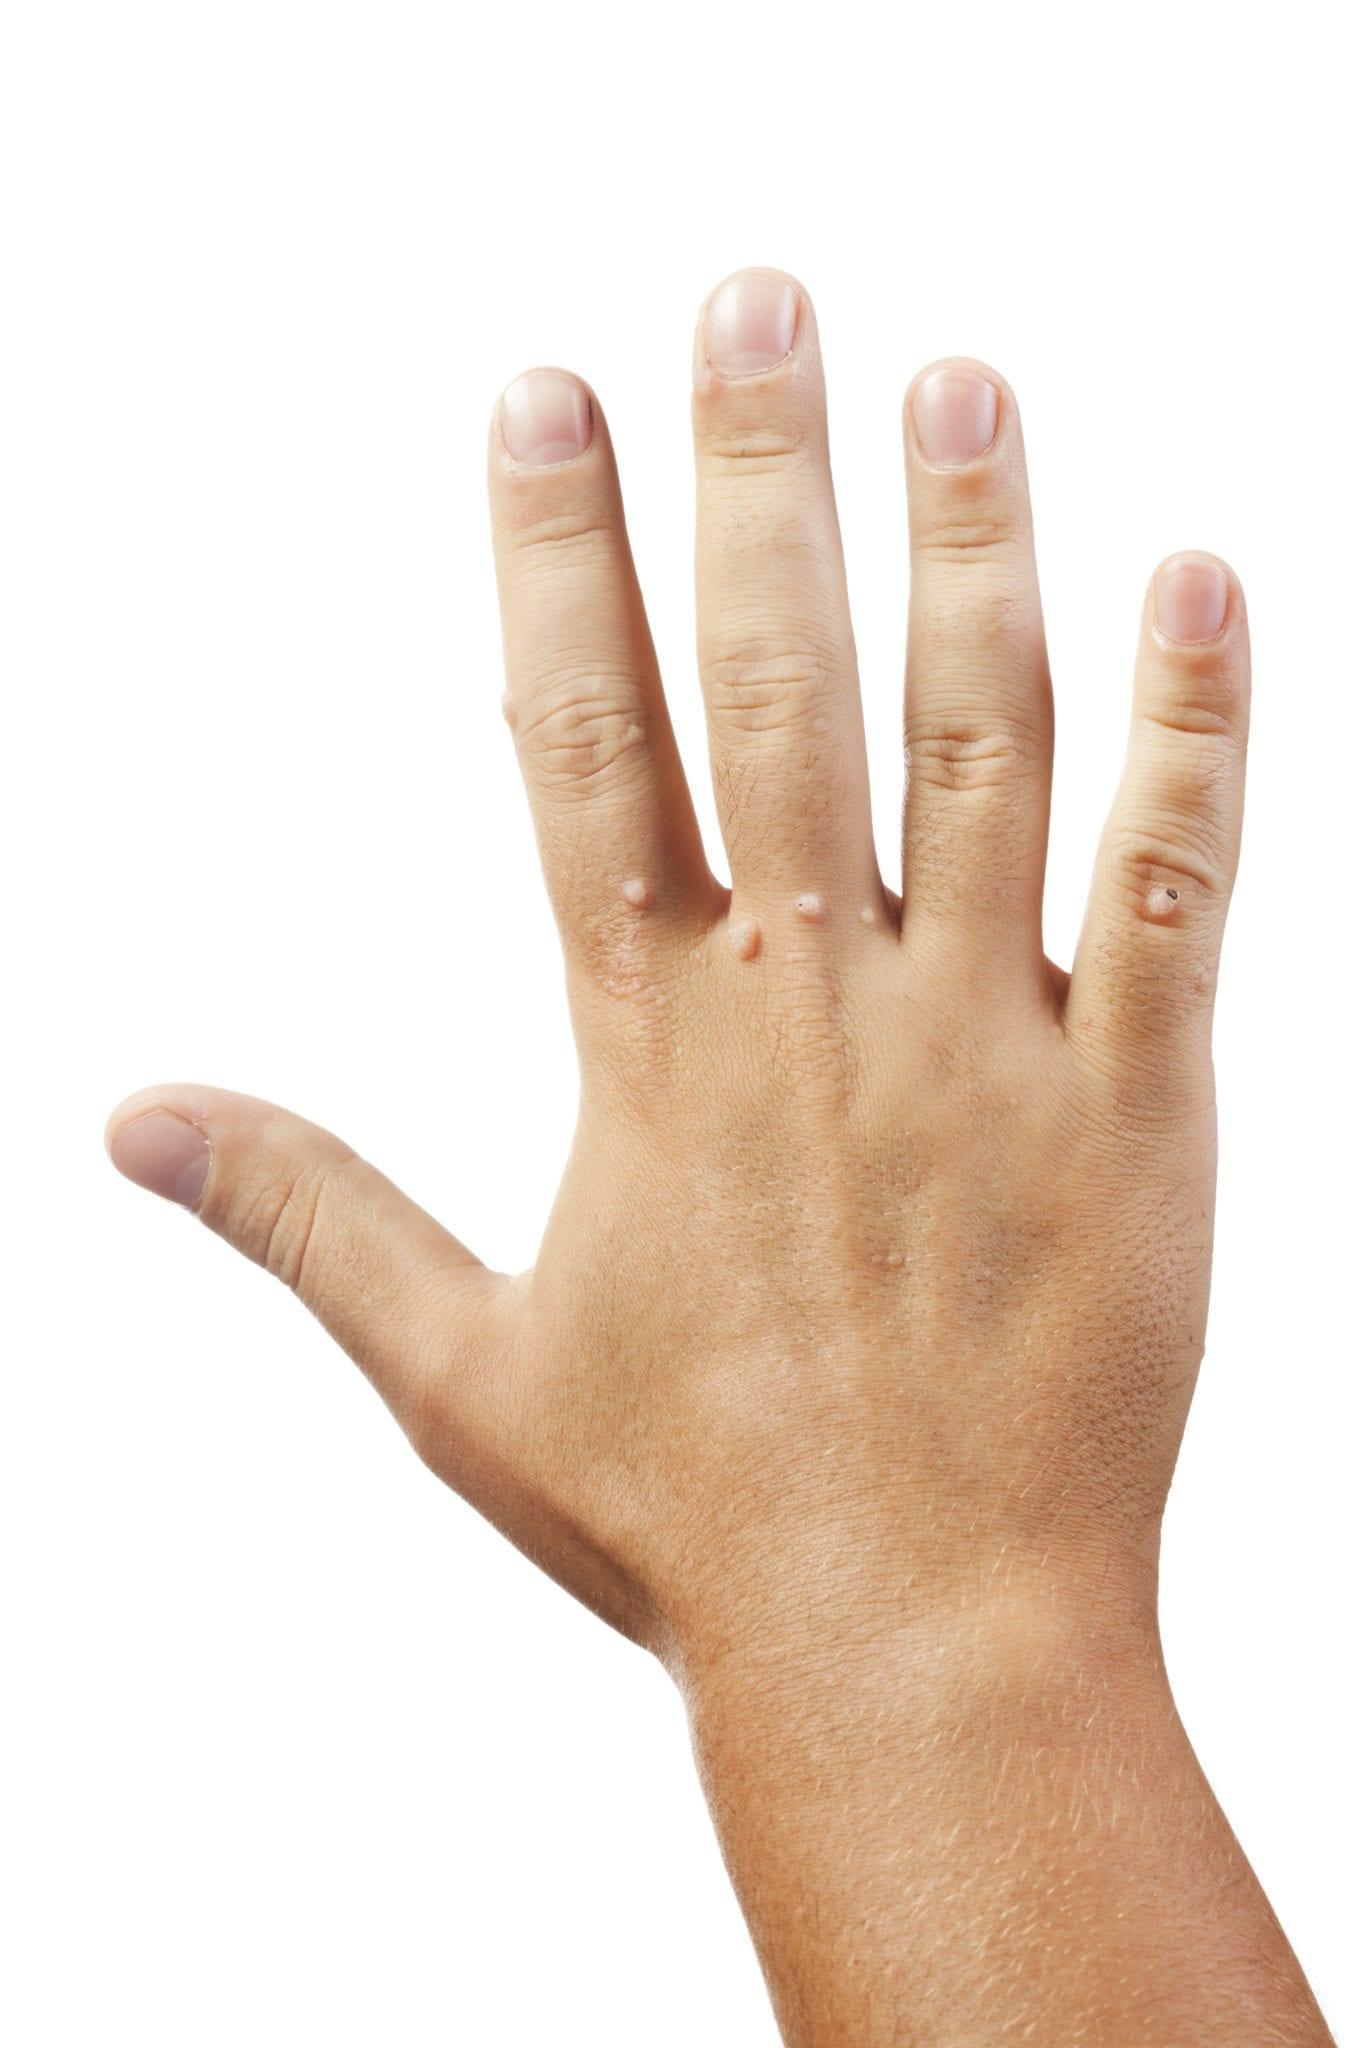 Warts pregnancy symptom. Diflucan Prospect Mg Warts on skin during pregnancy